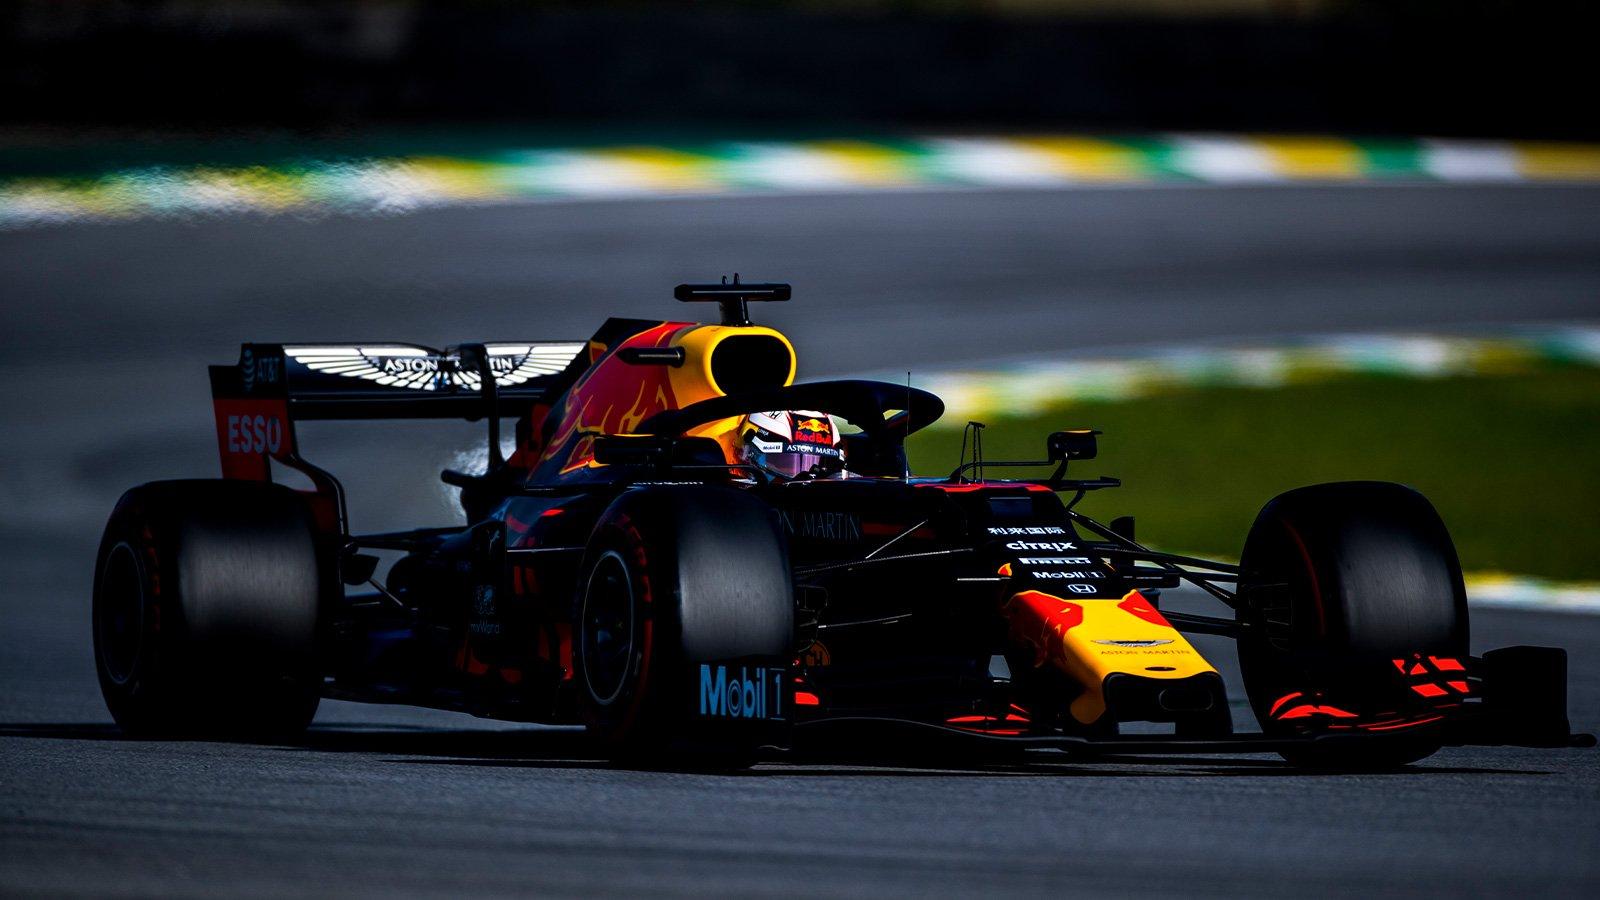 Макс Верстаппен выиграл Гран-при Бразилии 2019 года, Гасли на подиуме, Квят — 10-й